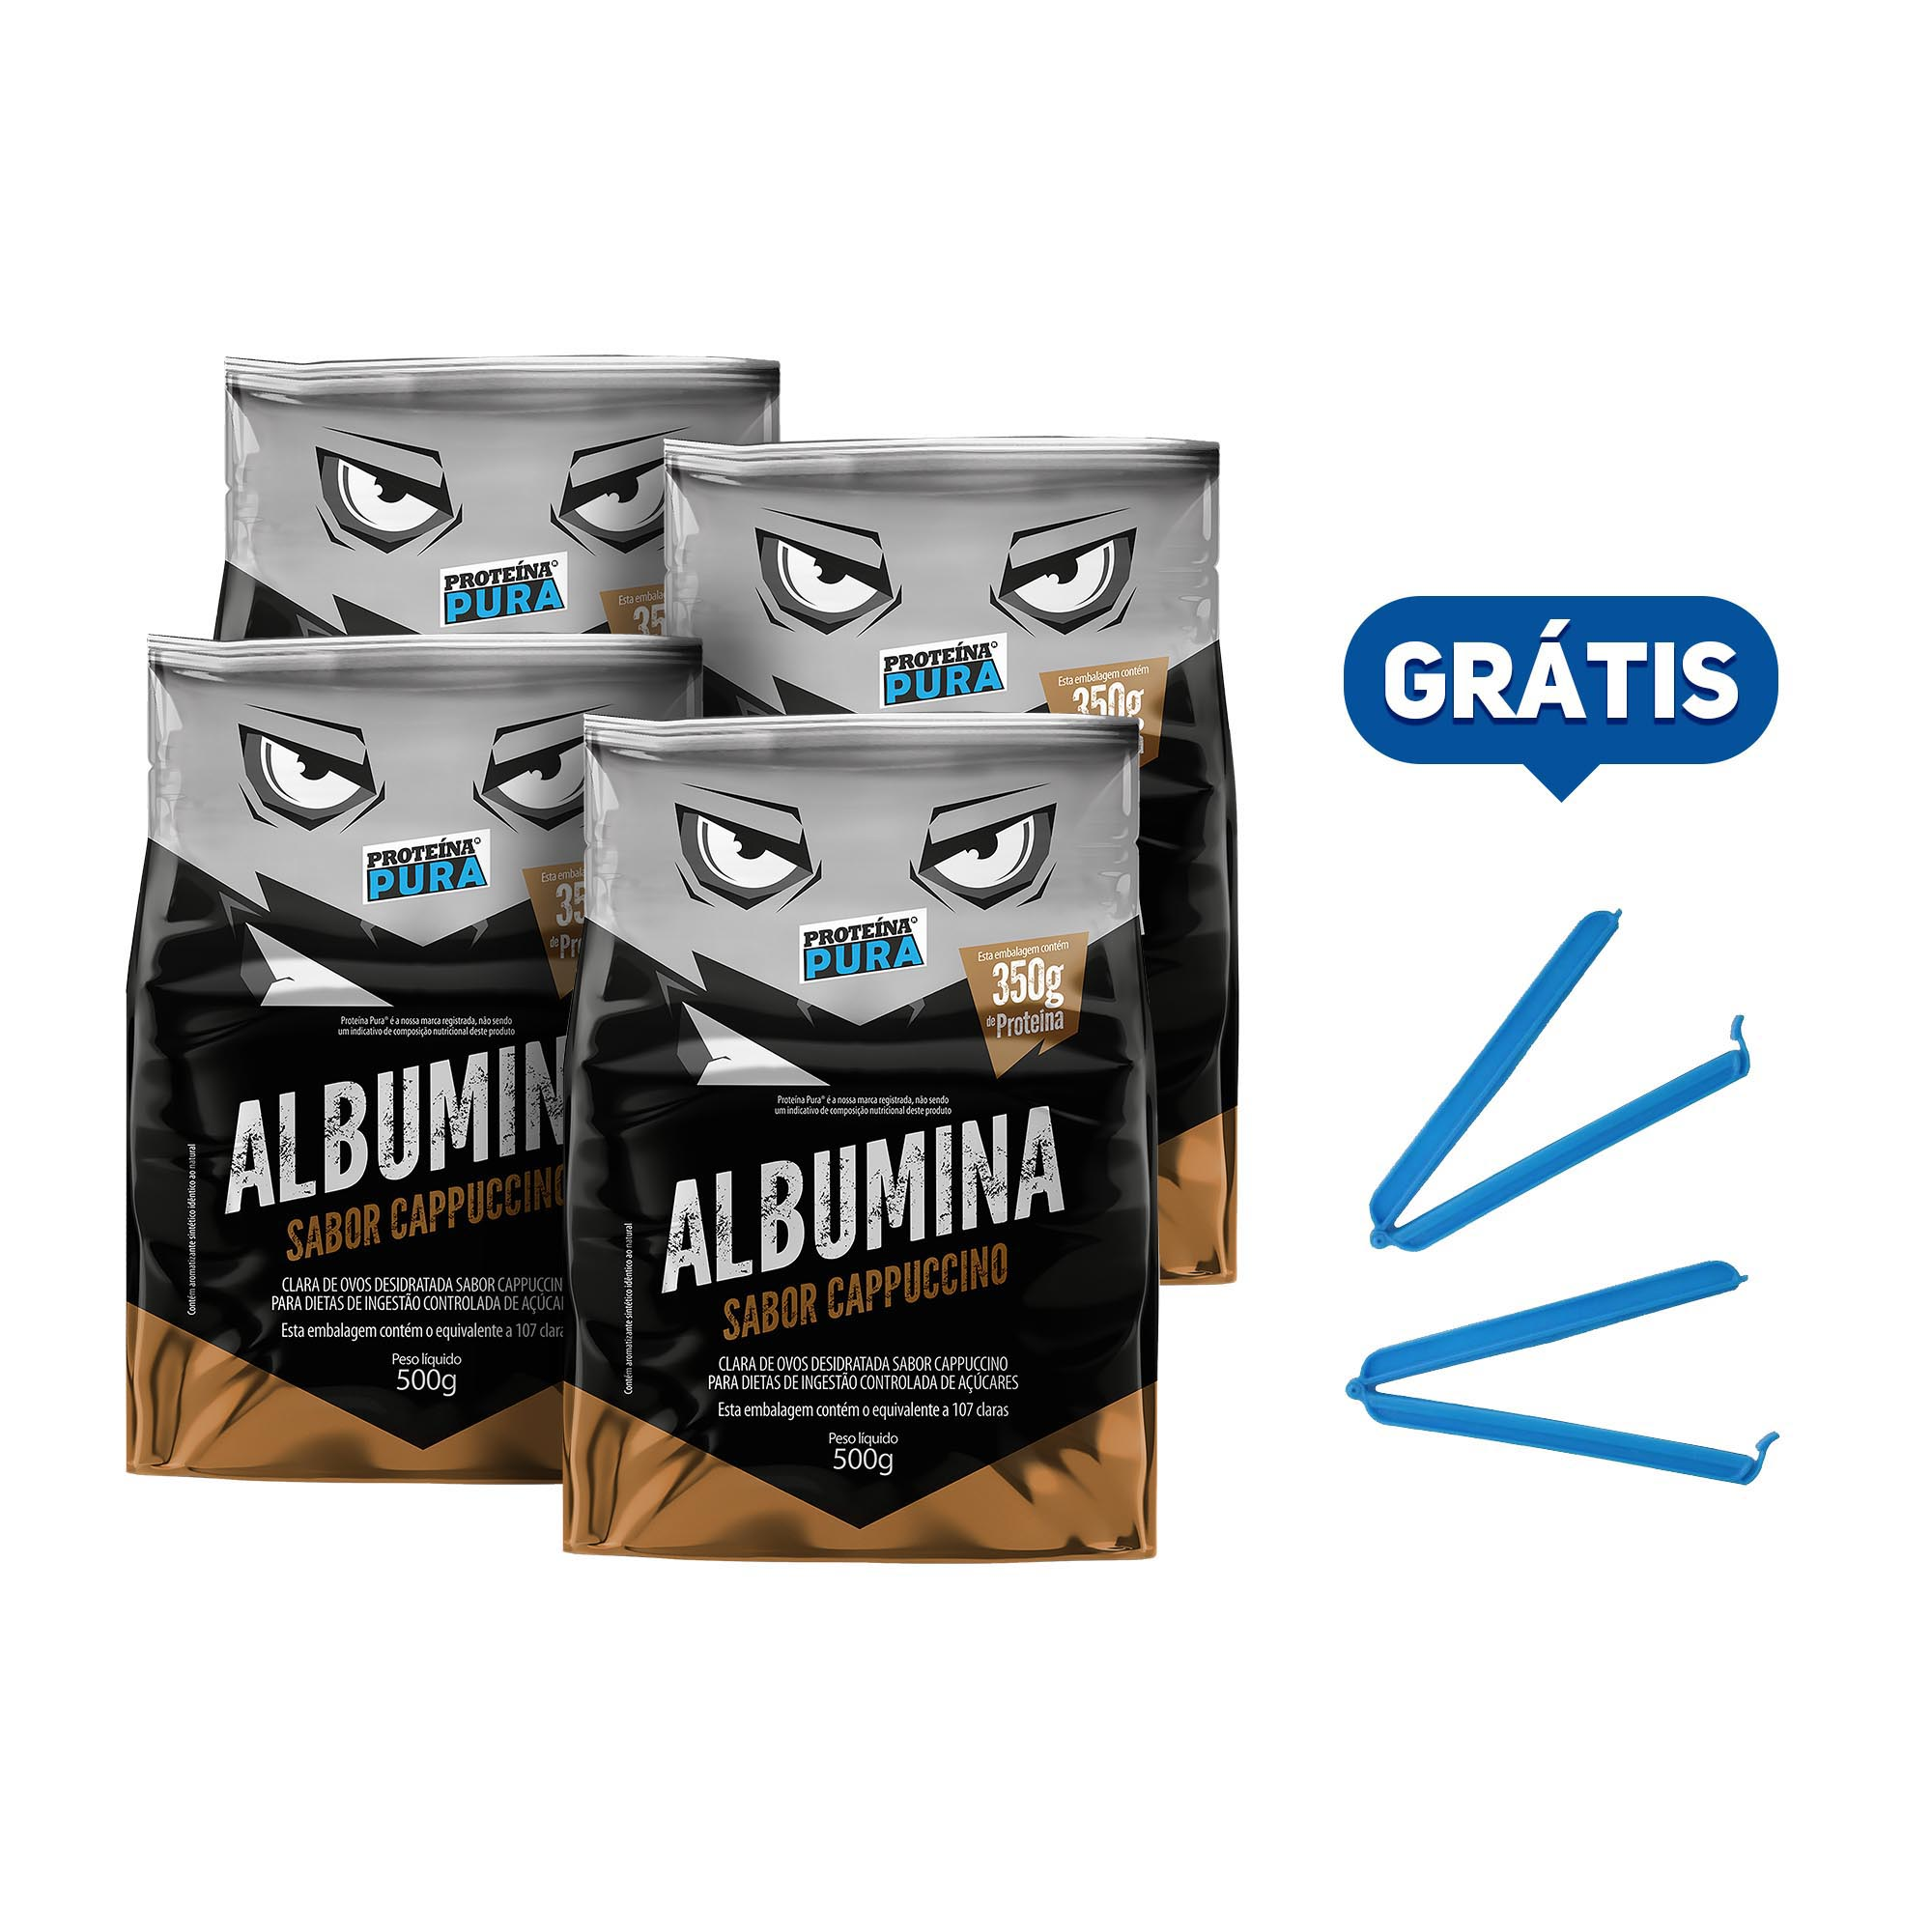 Kit Albumina Cappuccino - (4 un x 500g) - Proteína Pura